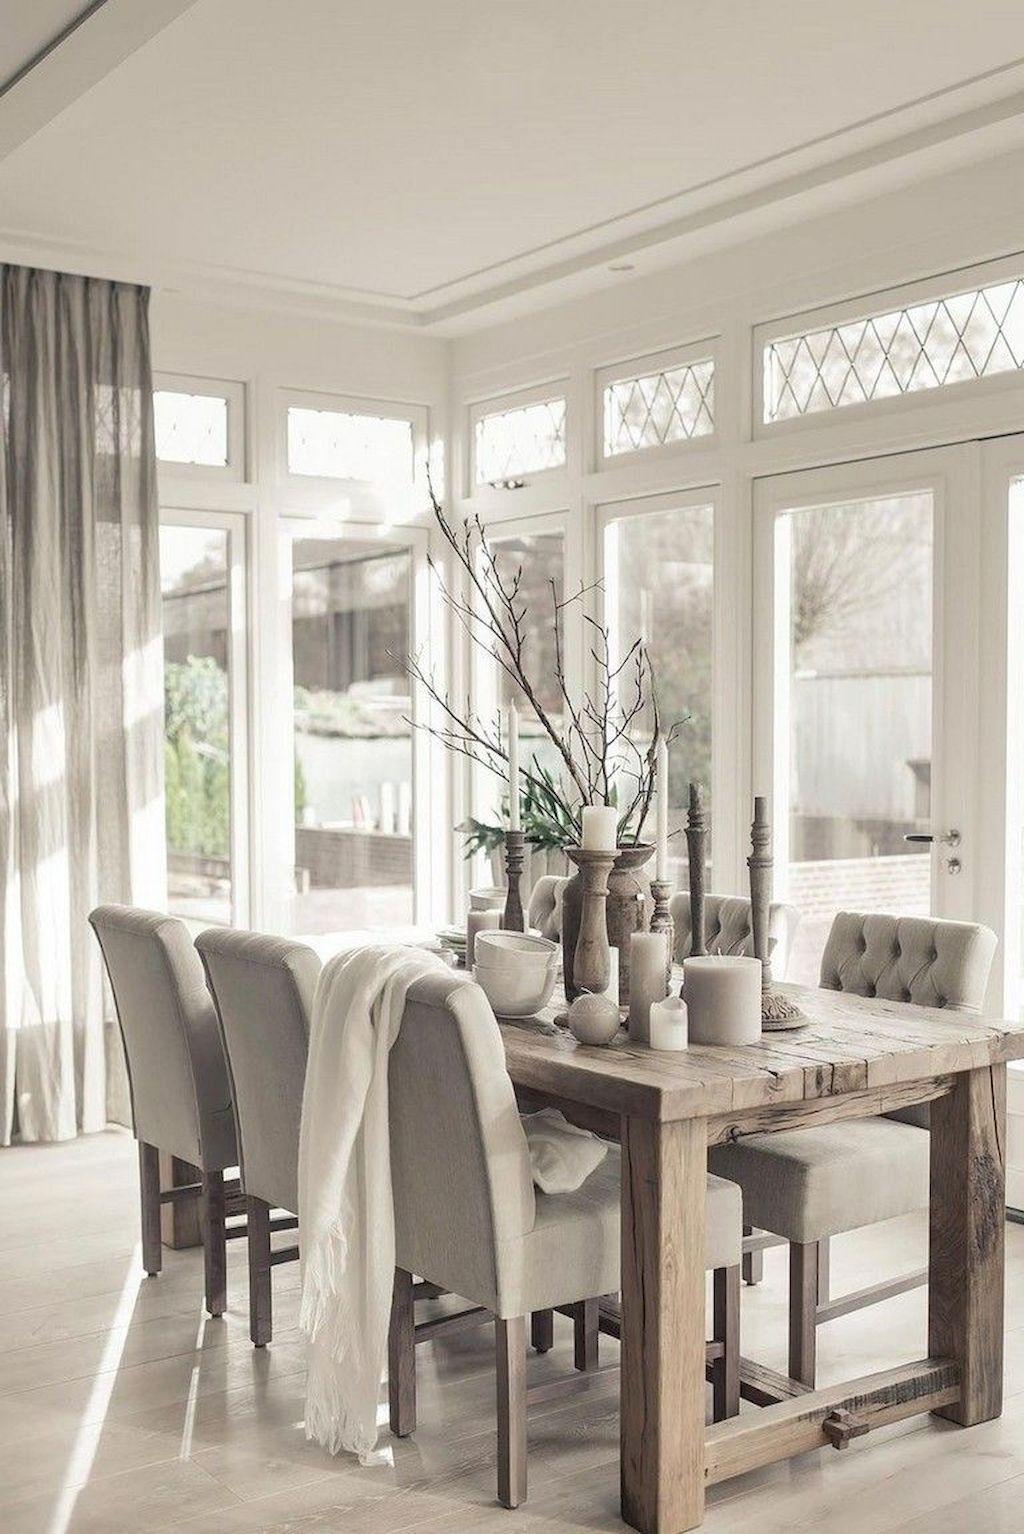 Popular Farmhouse Dining Room Design Ideas Trend 2019 19